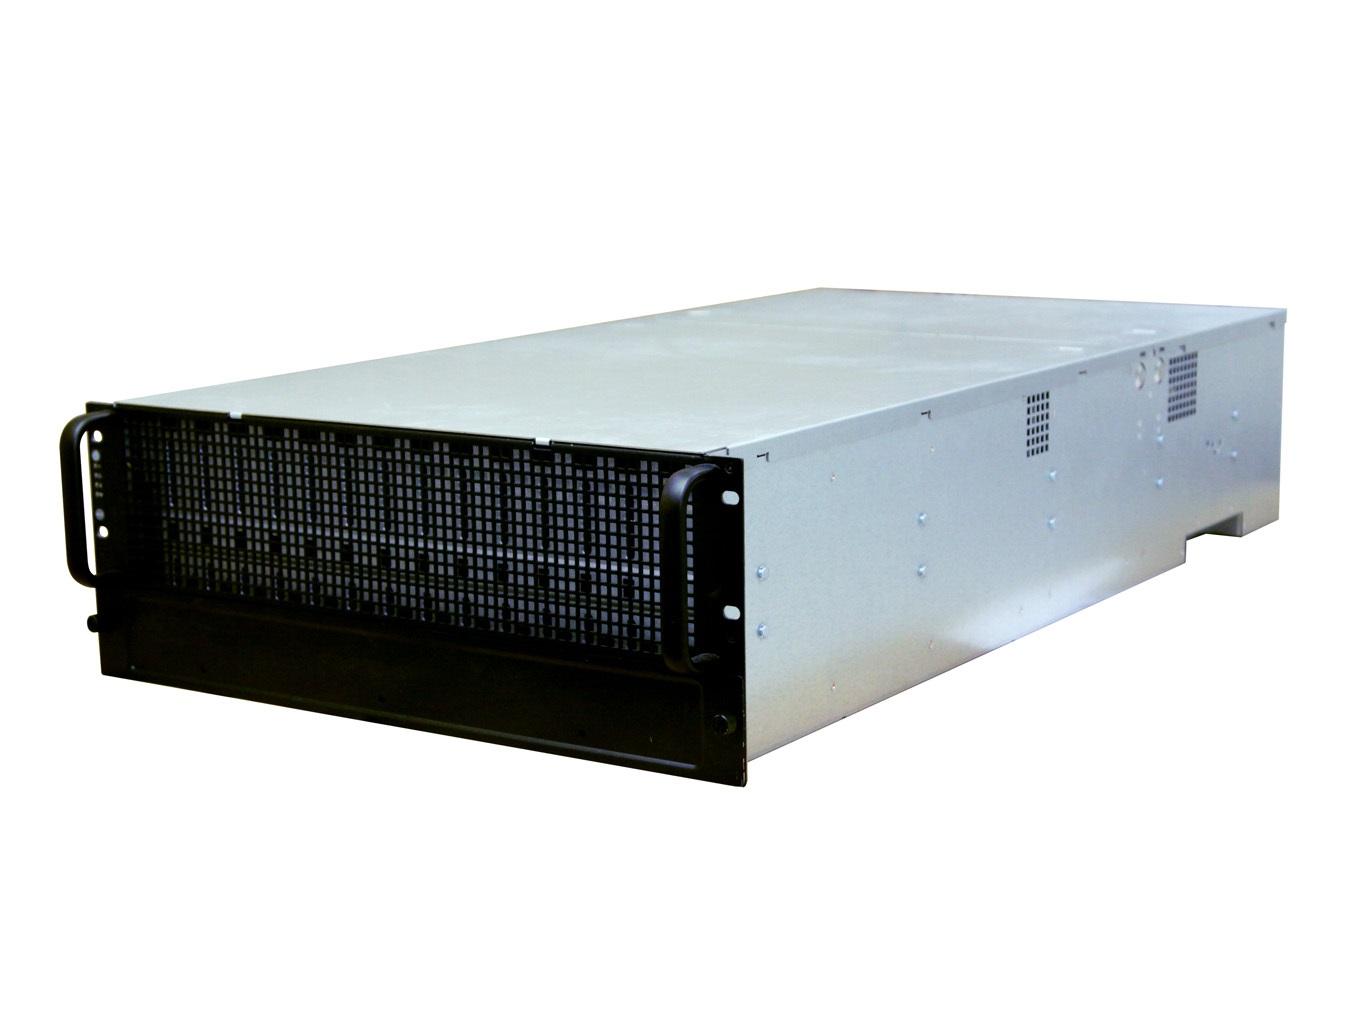 AIC J4060-01 XJ1-40601-04 4U 60-Bay 12Gb/s SAS JBOD